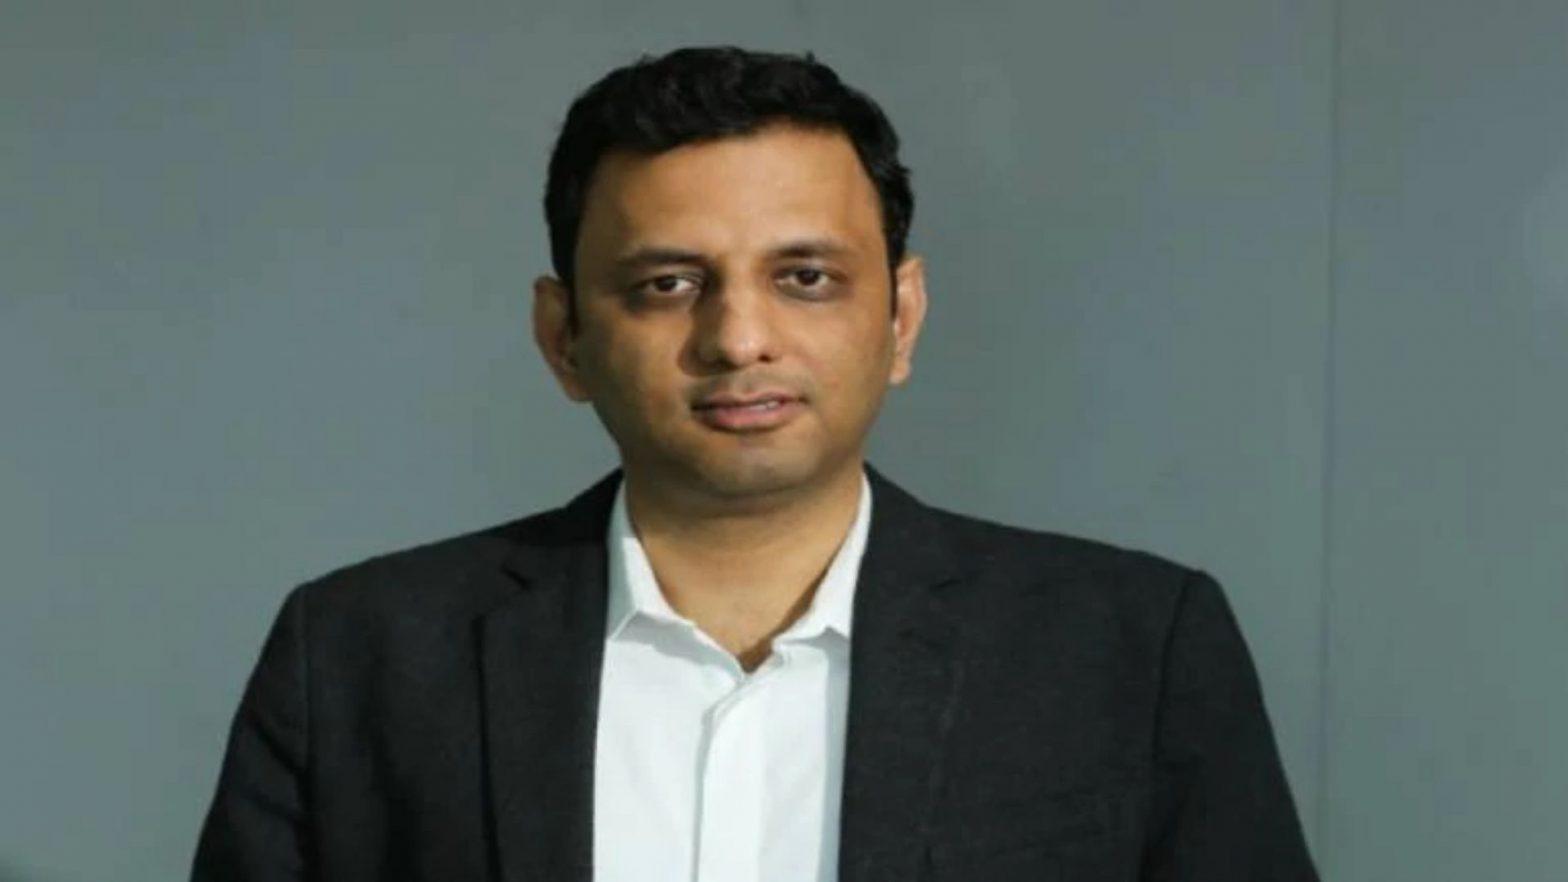 Gautam Thakar made global CEO of OLX Autos_40.1